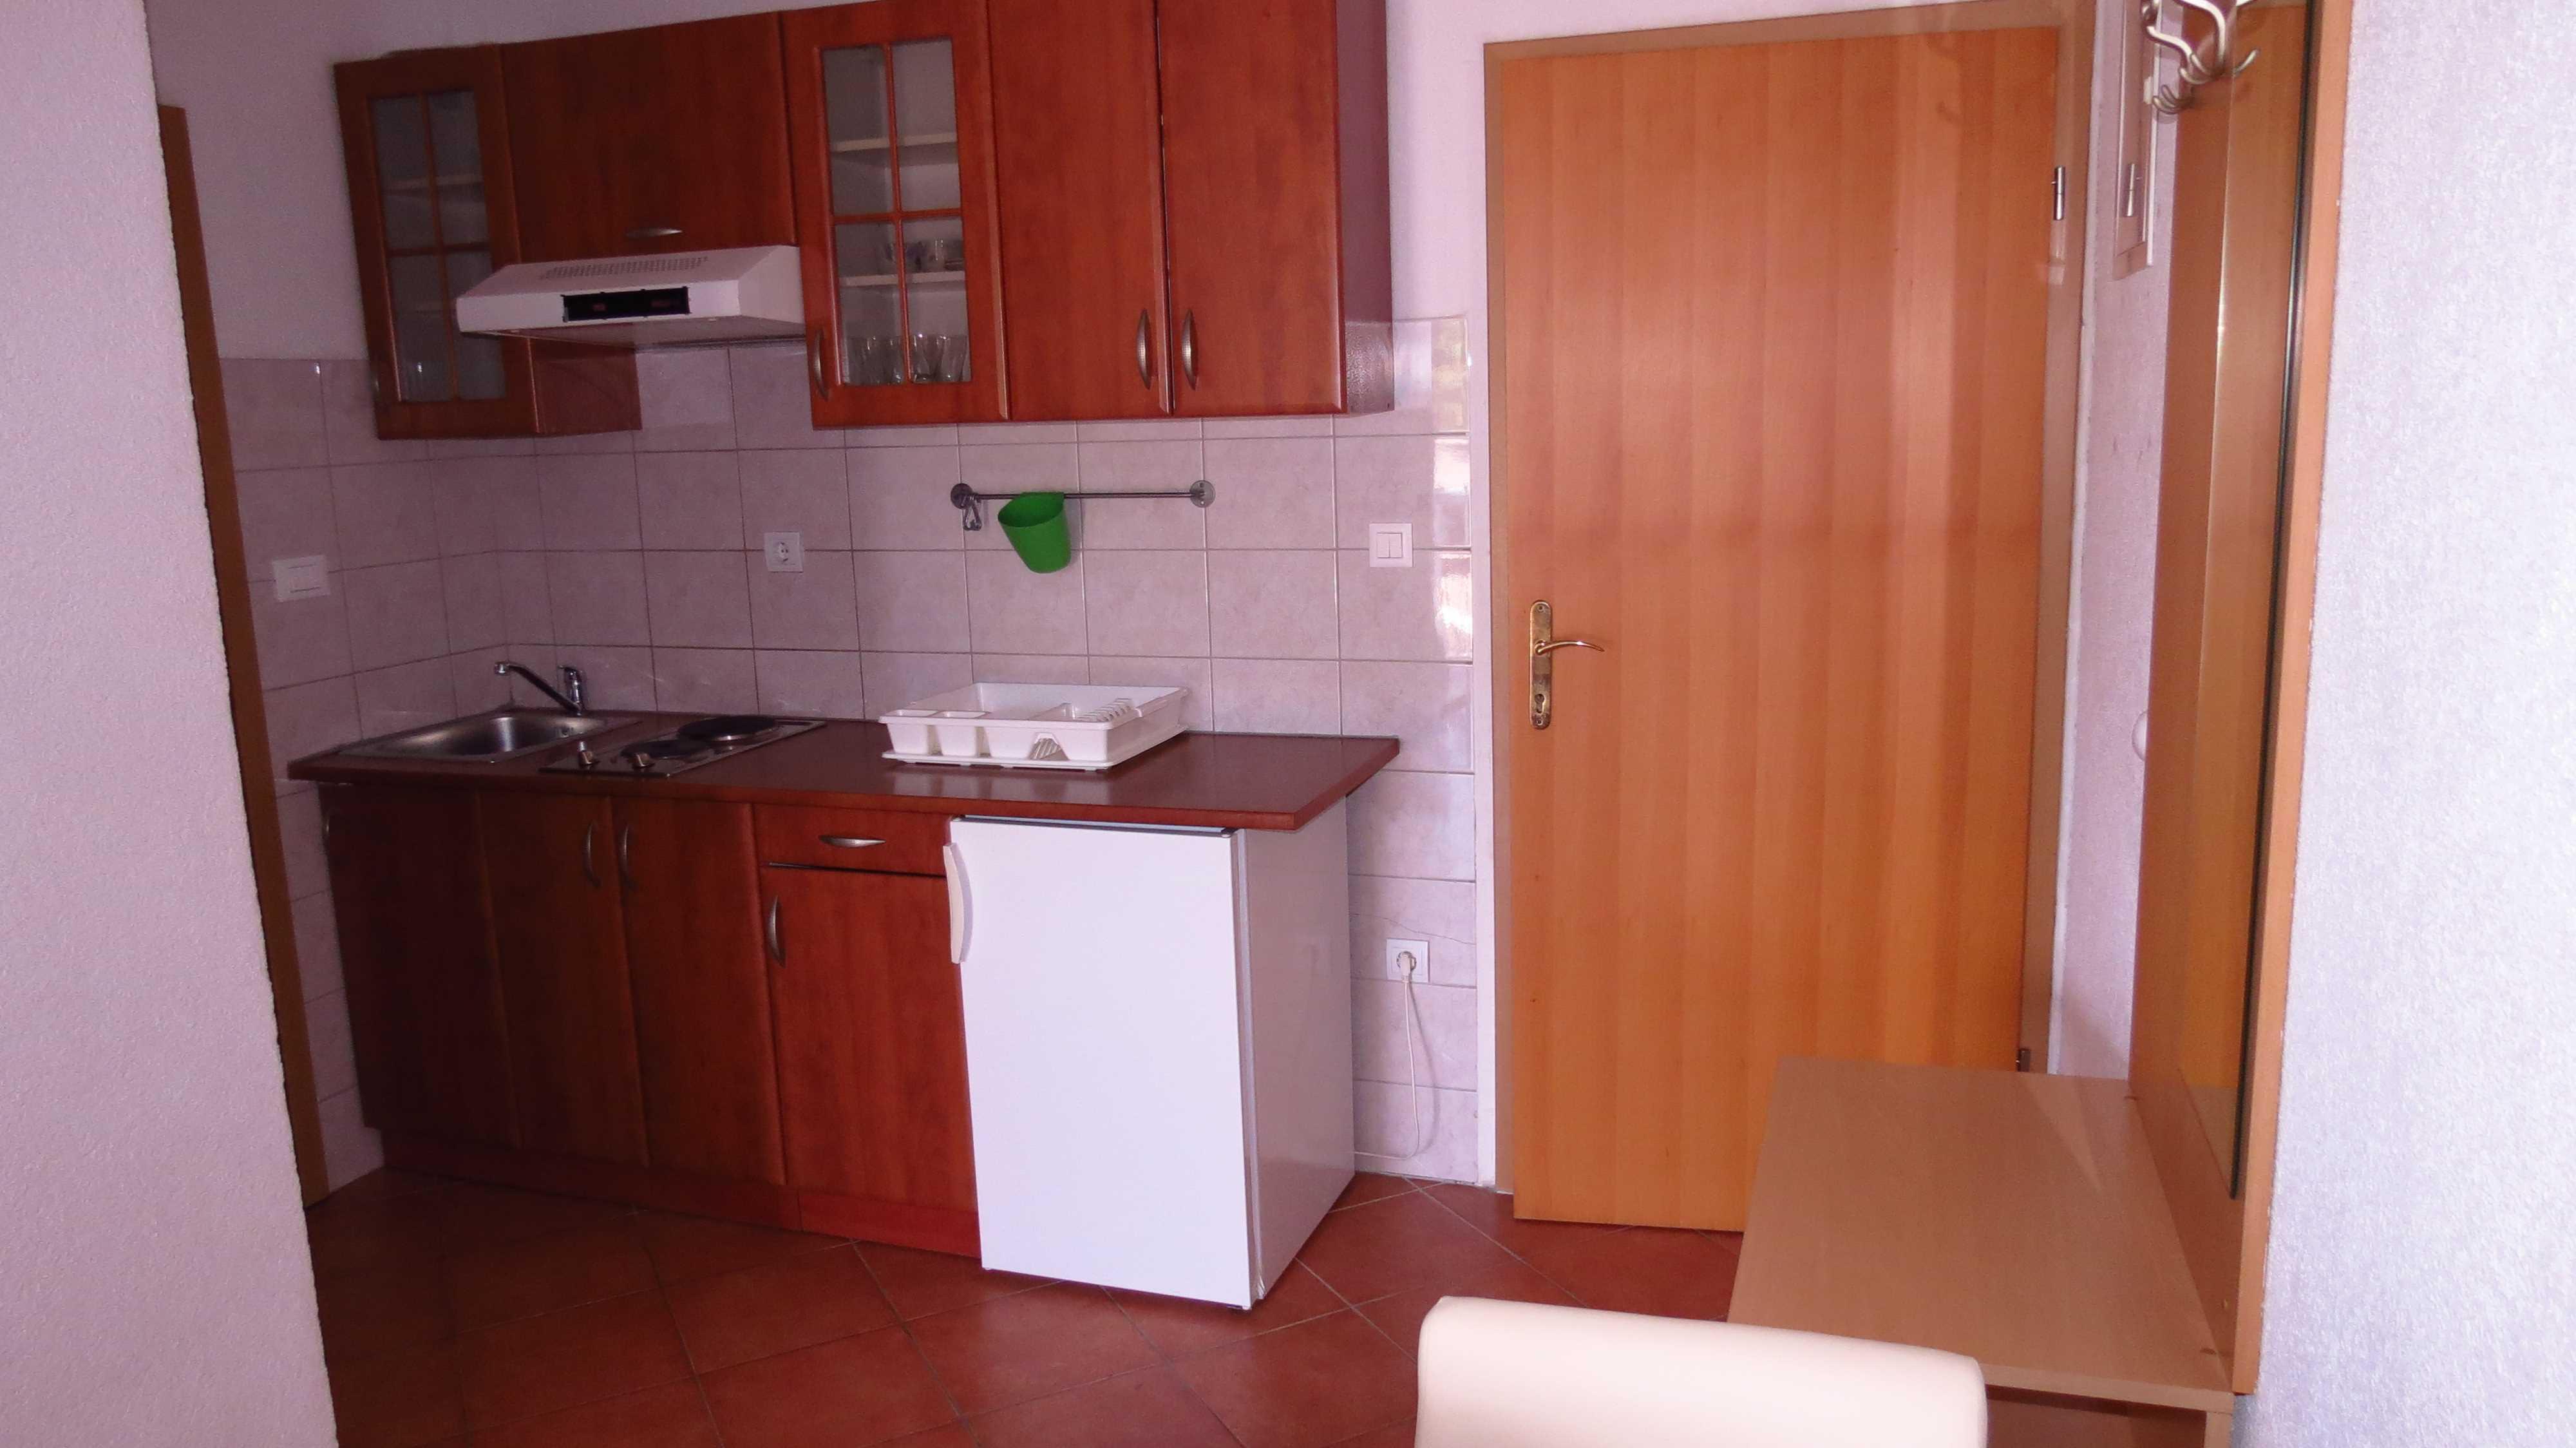 Apartamente PRVA MASLINA - apartment BRAČ 26277, Baška Voda, , Regiunea Split-Dalmatia